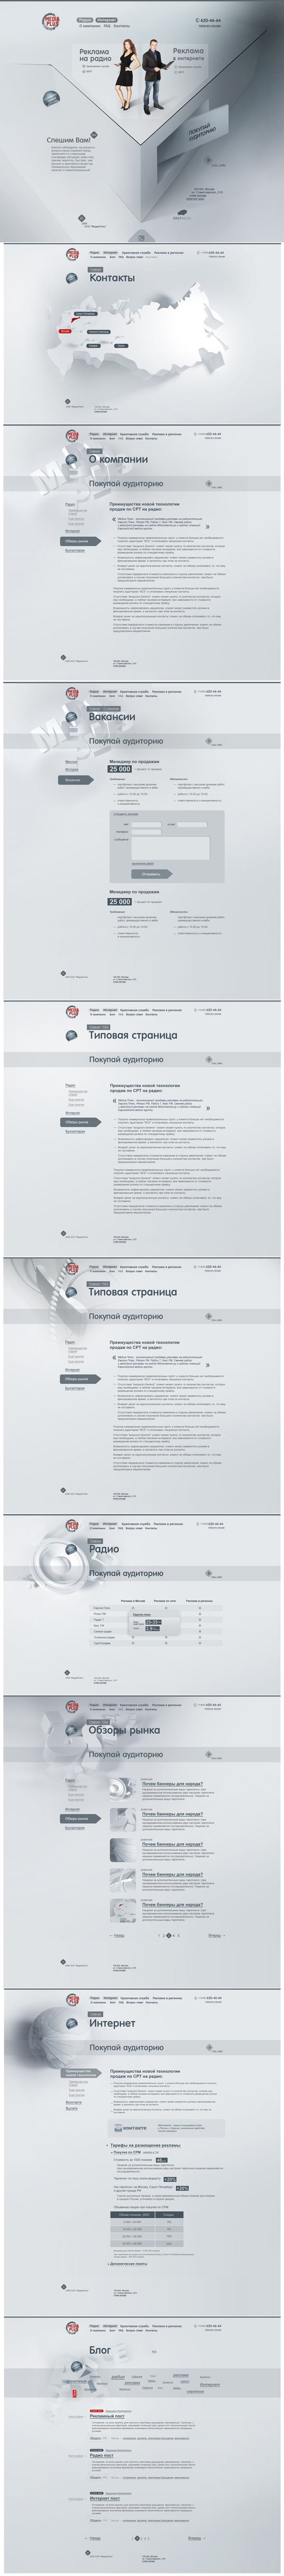 Media Plus by Ruslan Latypov, via Behance